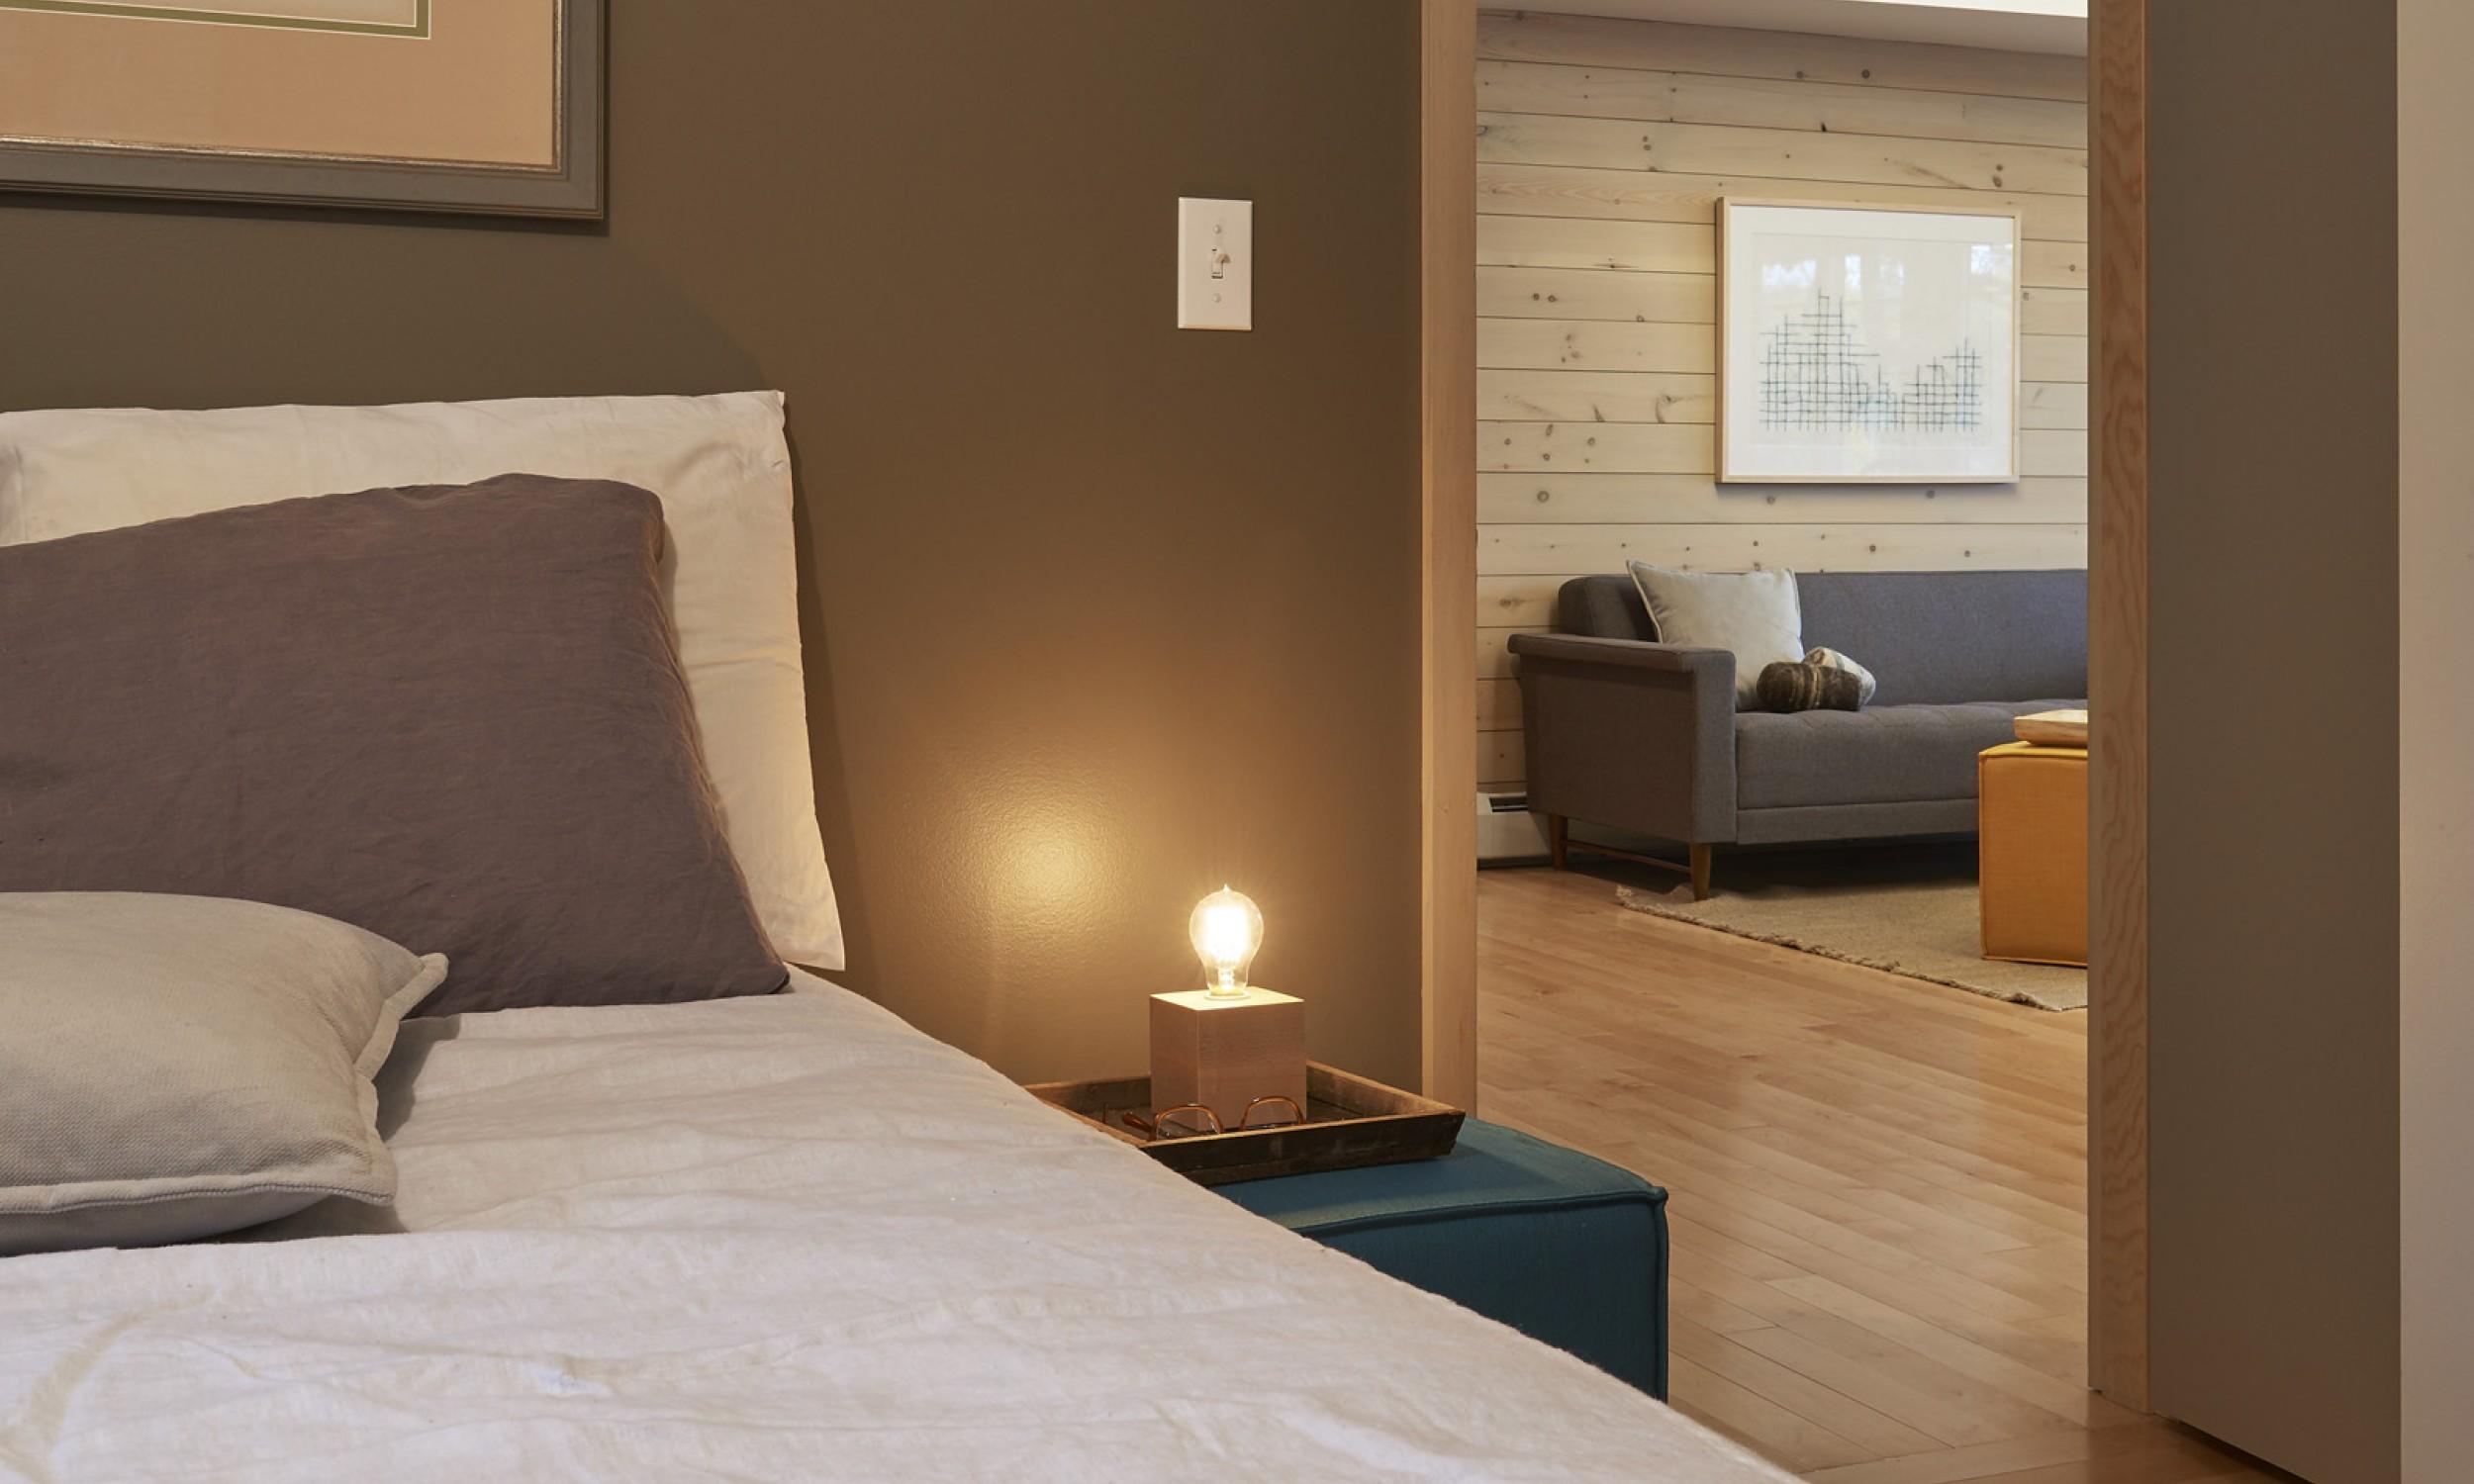 Bedroom photo, Maine Architect, Sherwin Williams paint